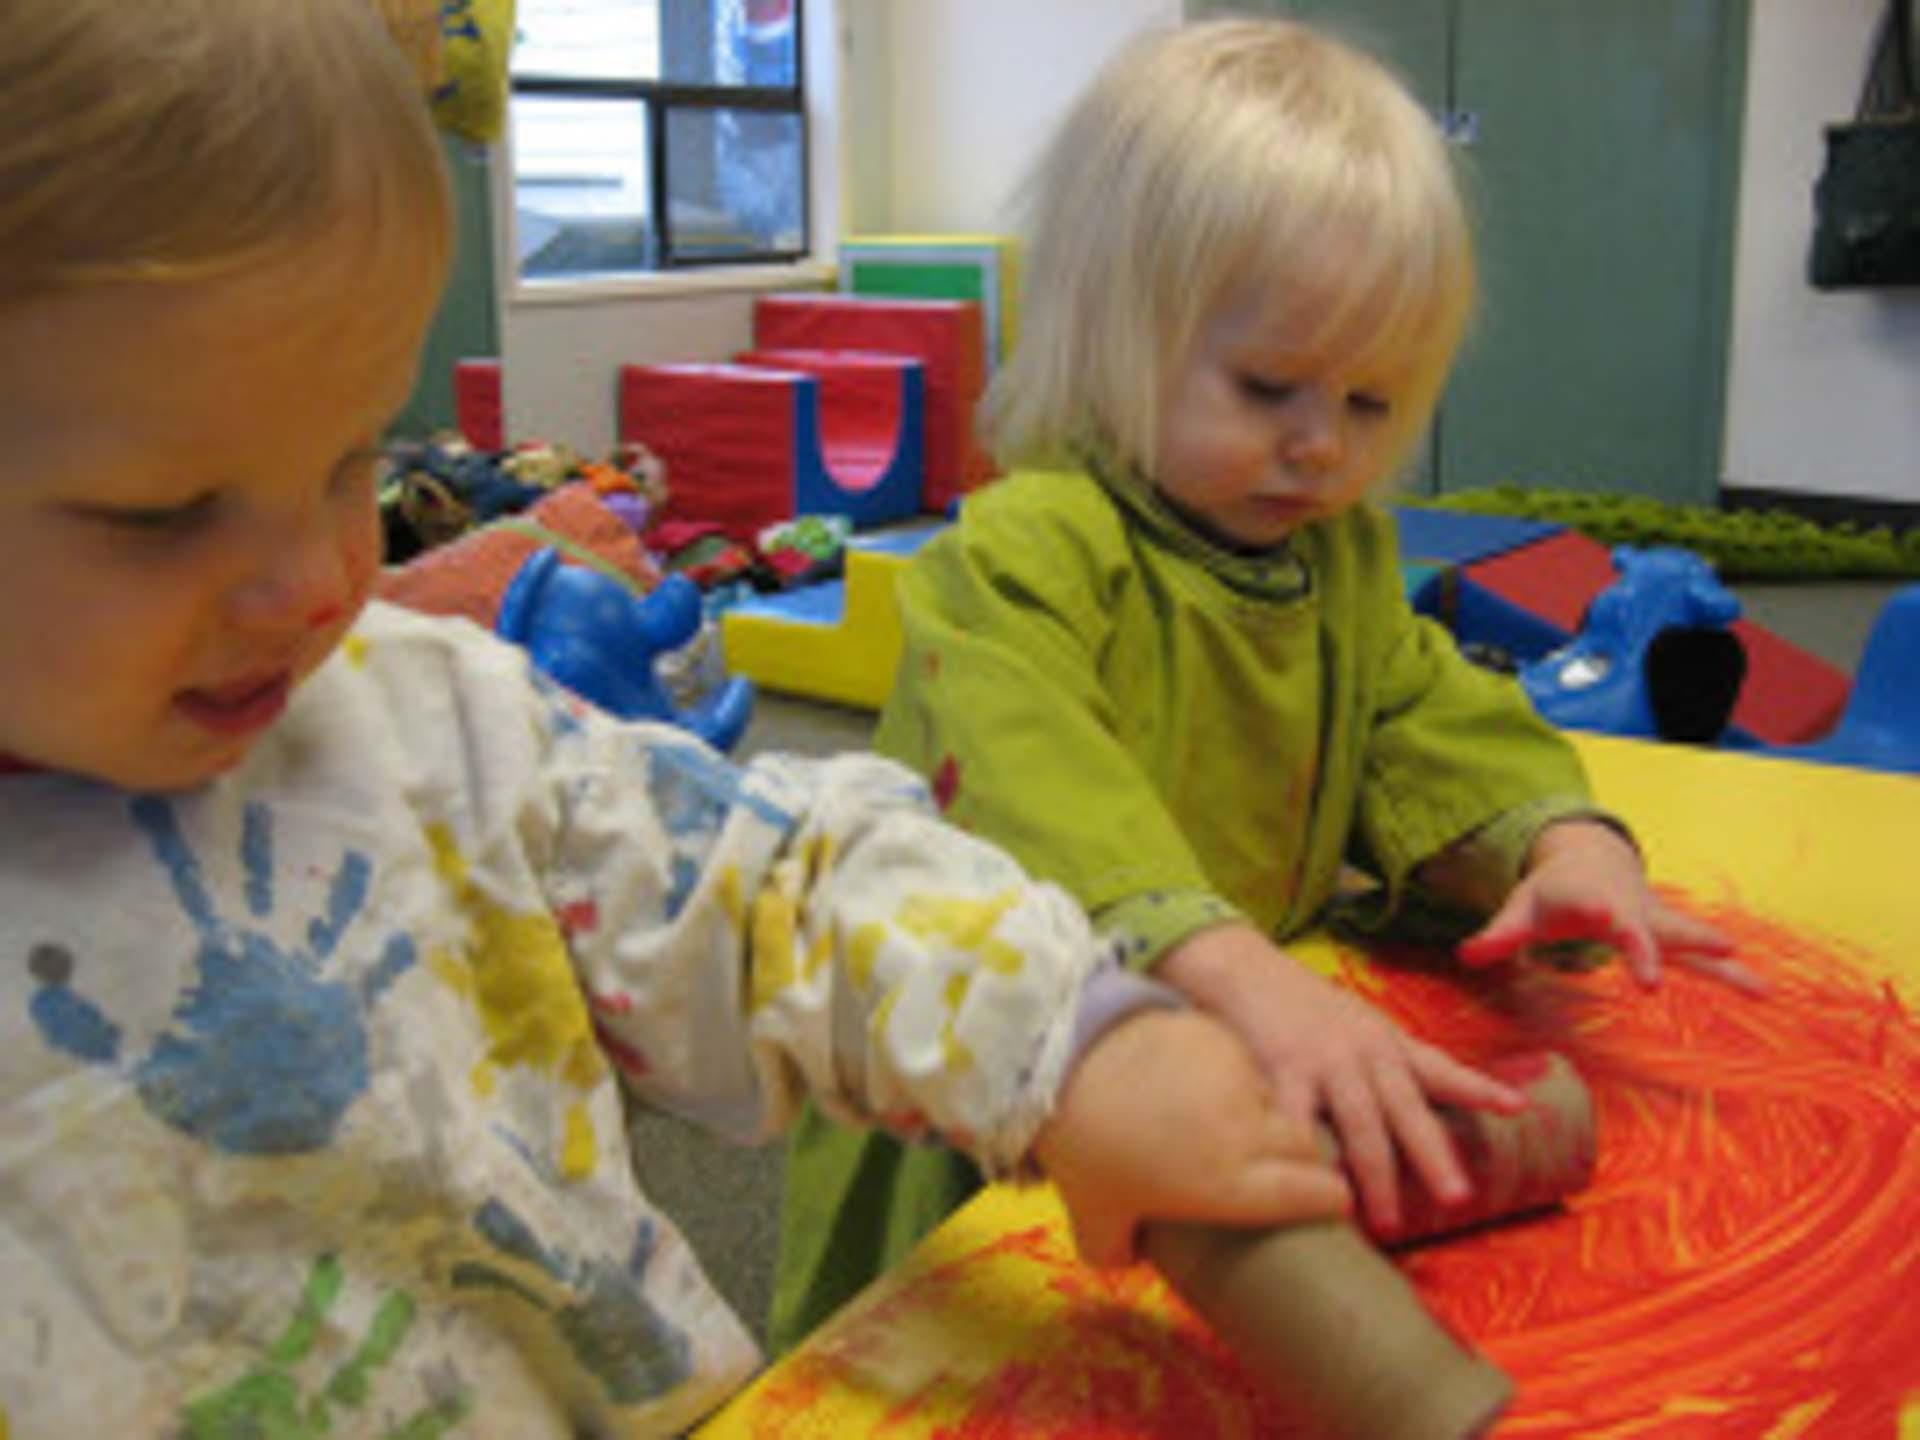 1.5 Toddler Image - cooperative play.JPG